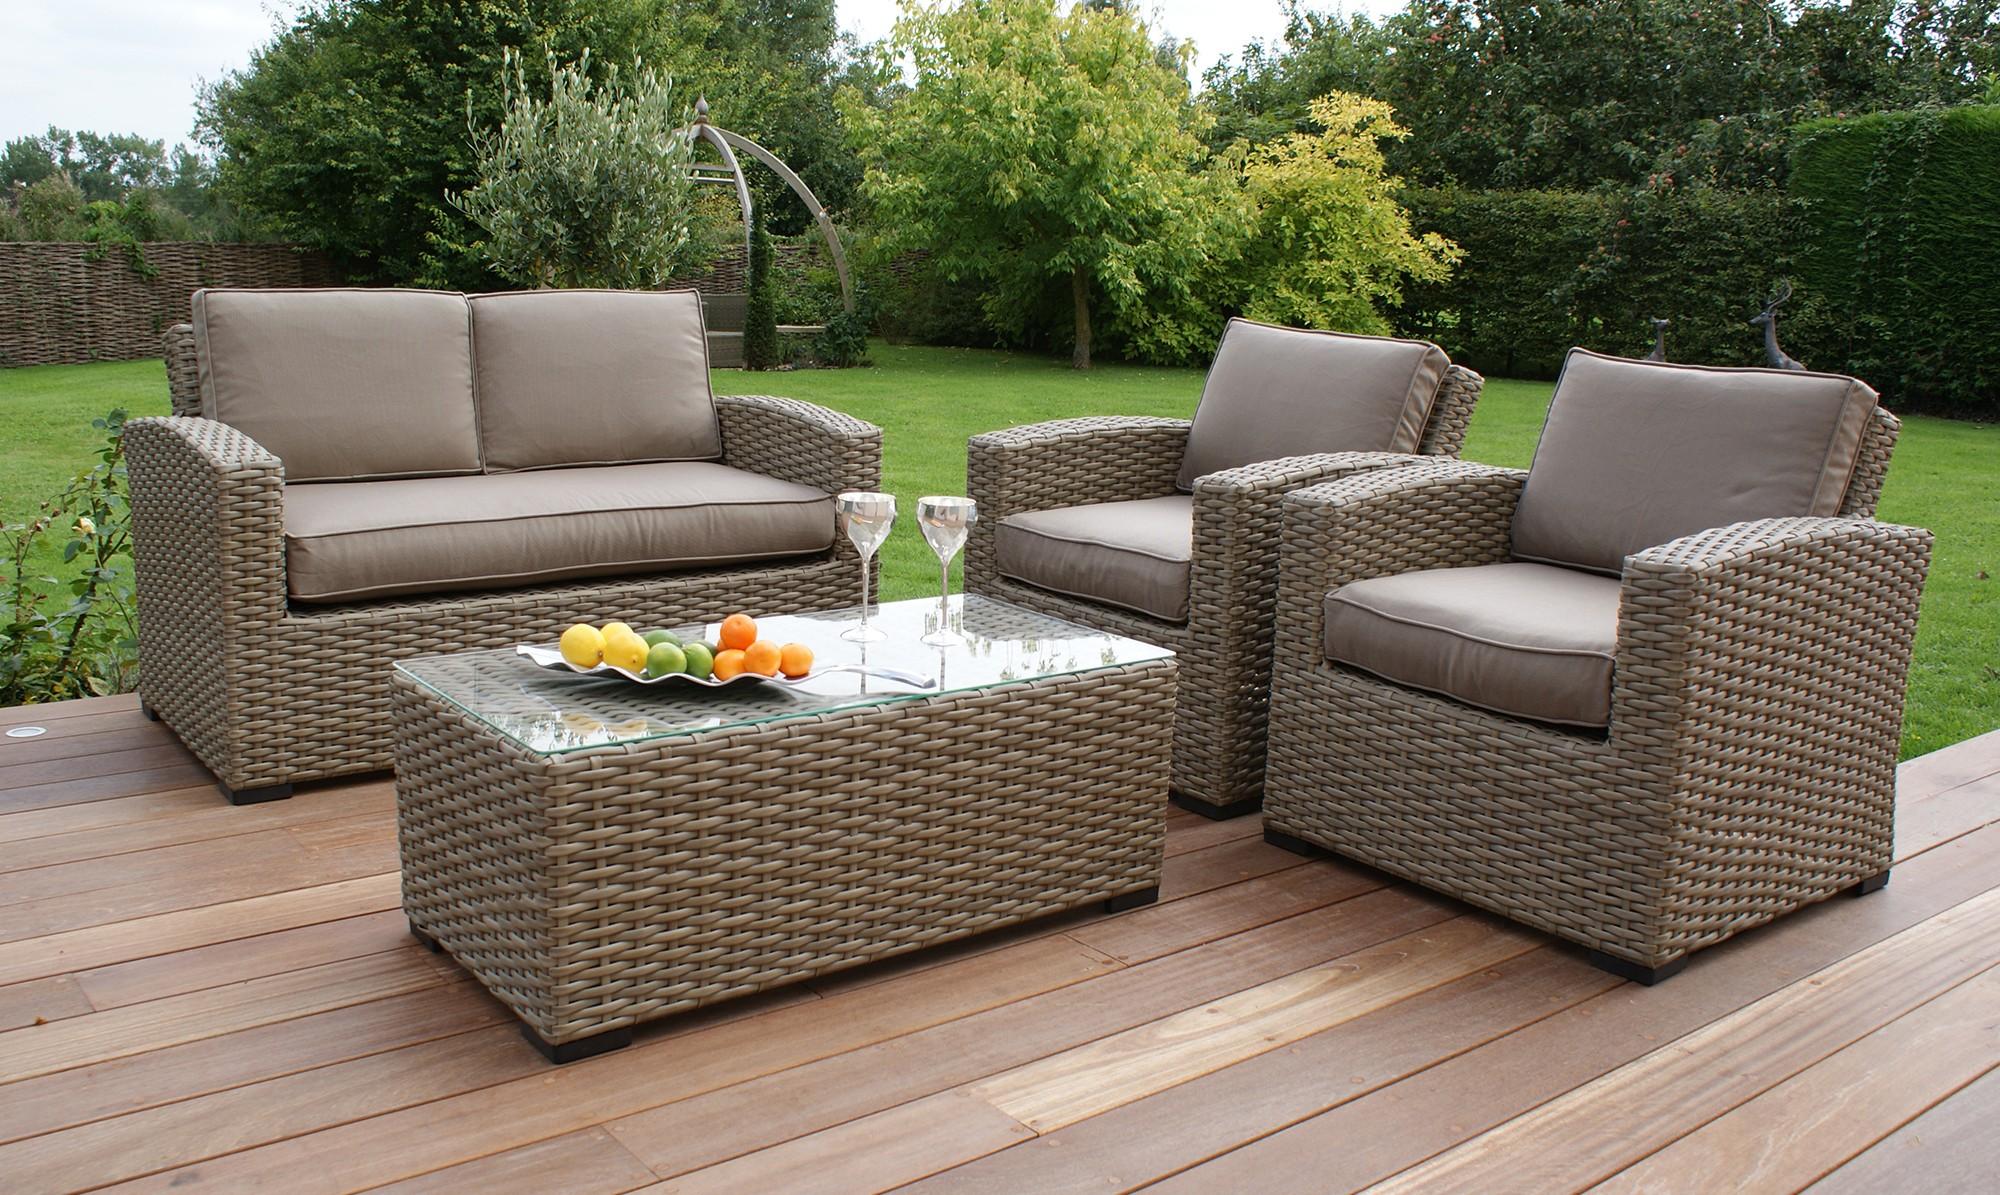 garden patio sets wicker garden furniture sets boutdoor rattan garden furniture which rattan garden YWQXSFU